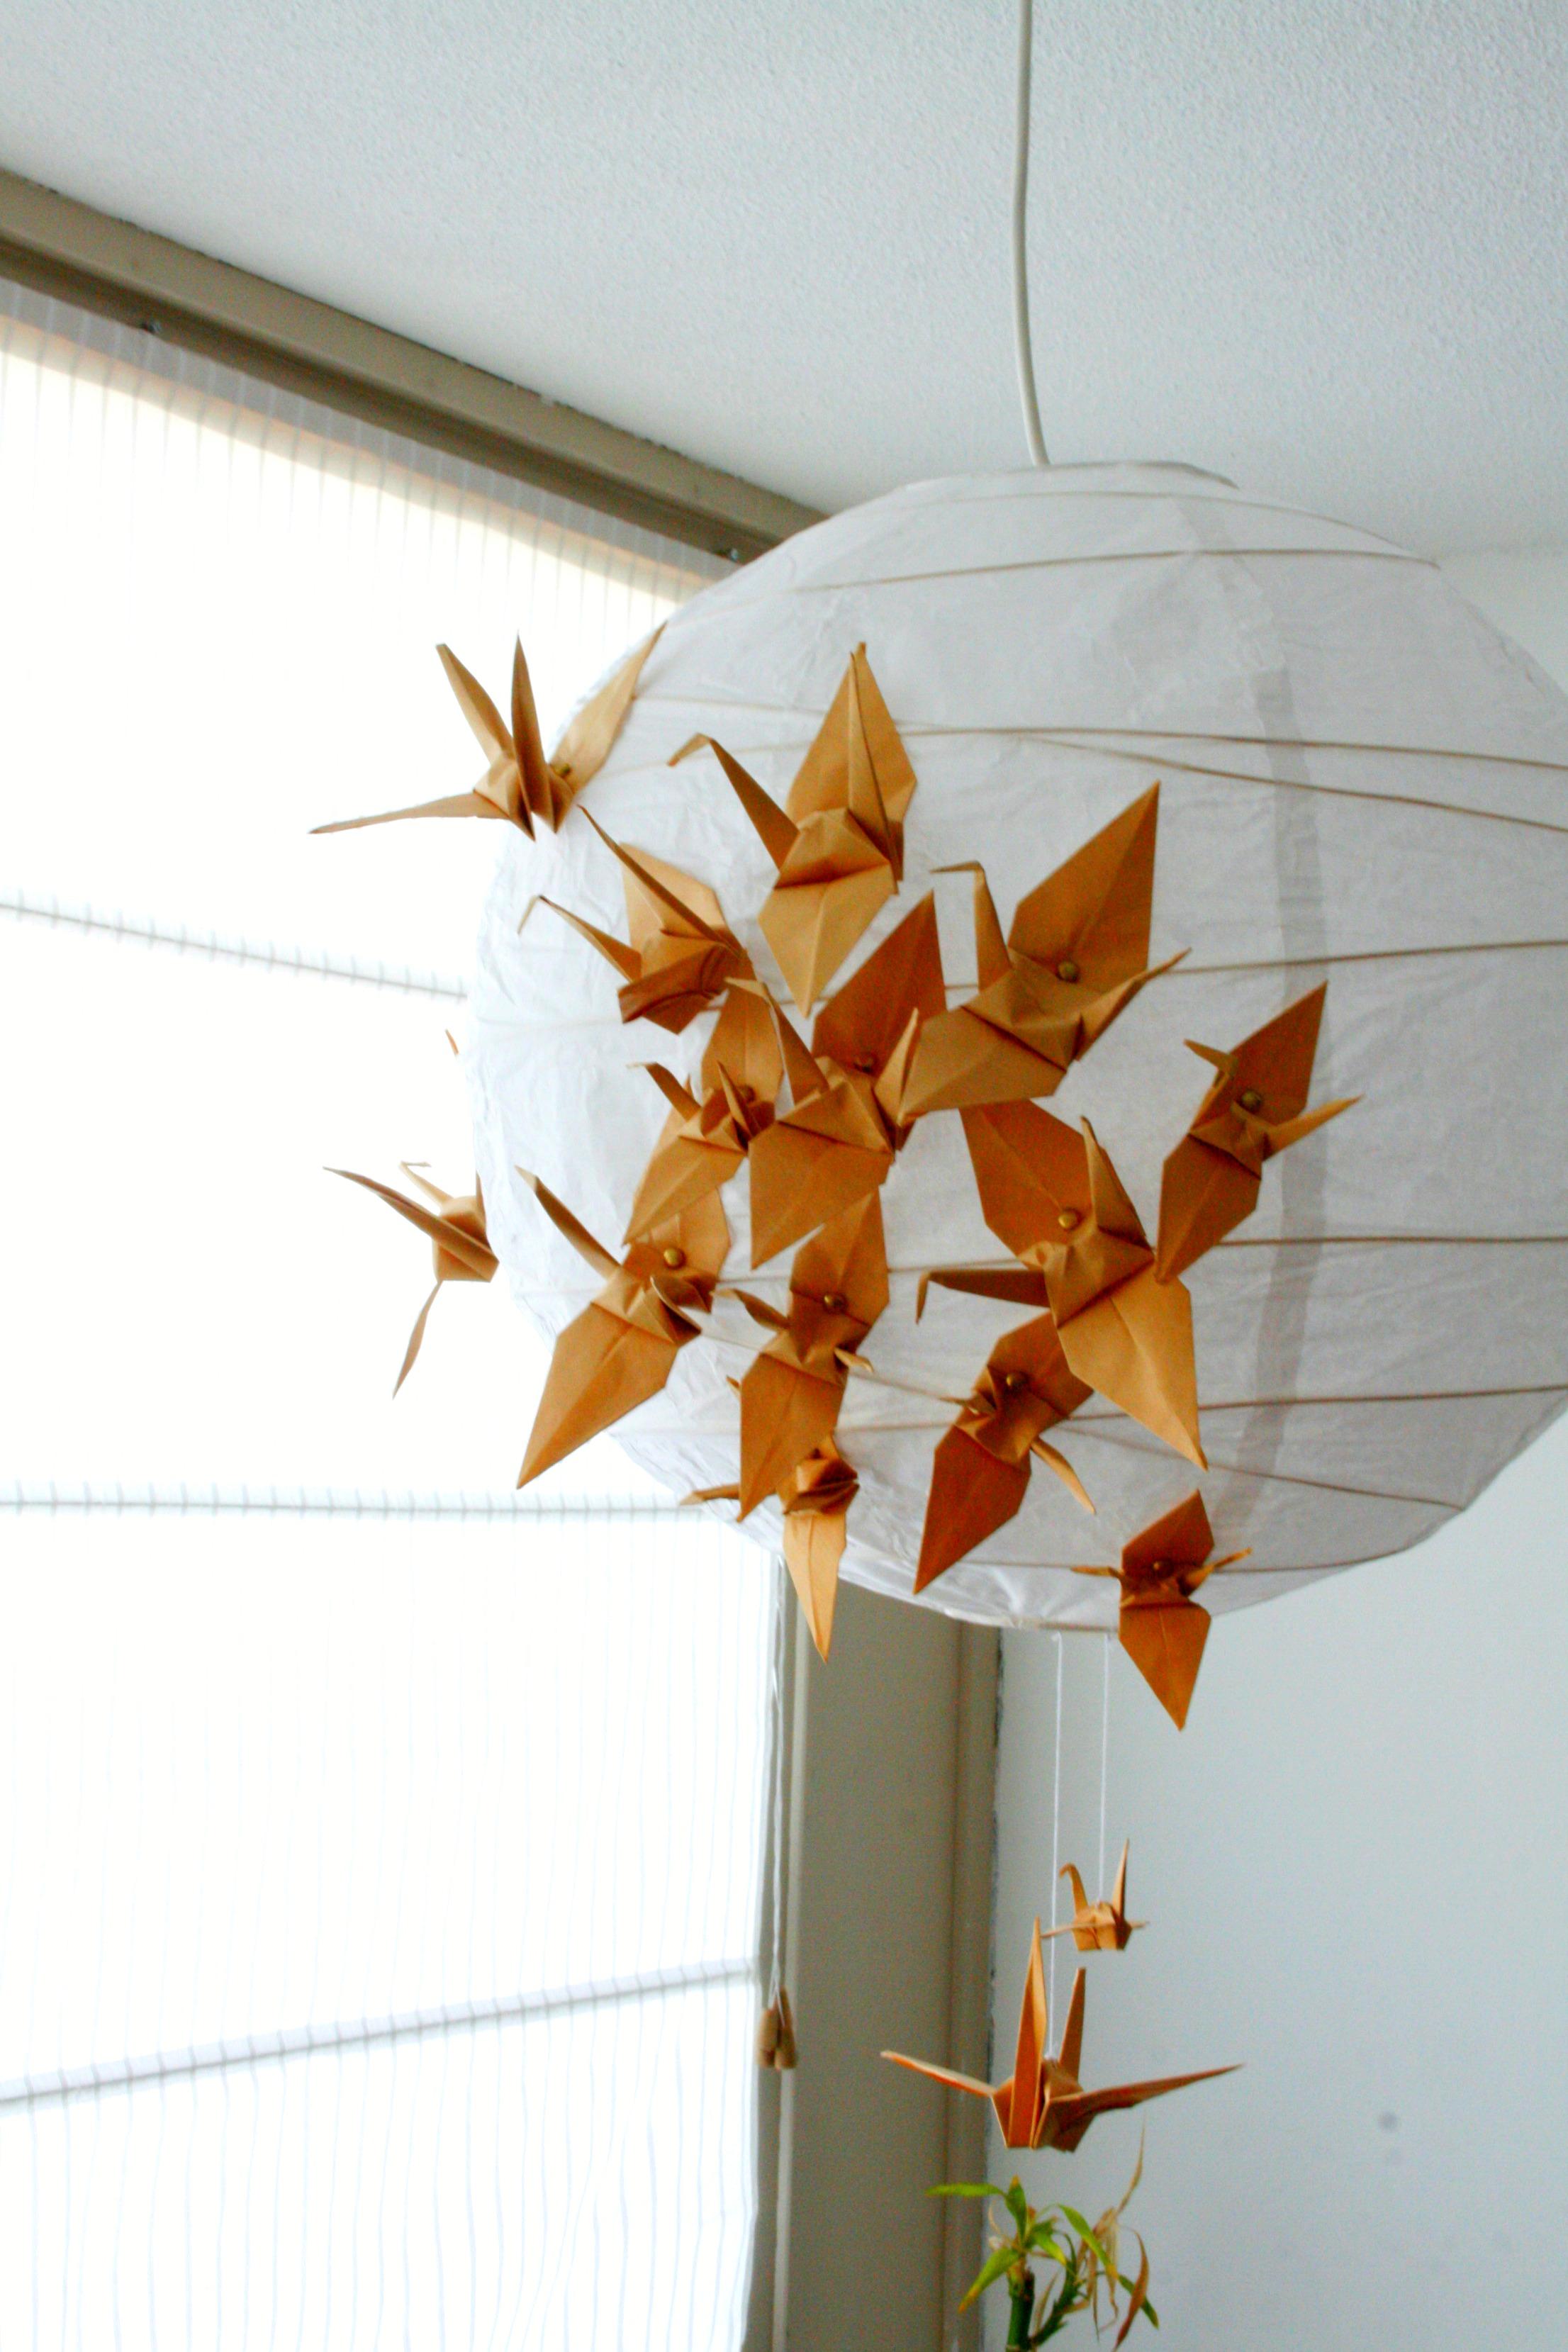 Lampadari fai da te: idee facili e veloci [FOTO]  Pourfemme